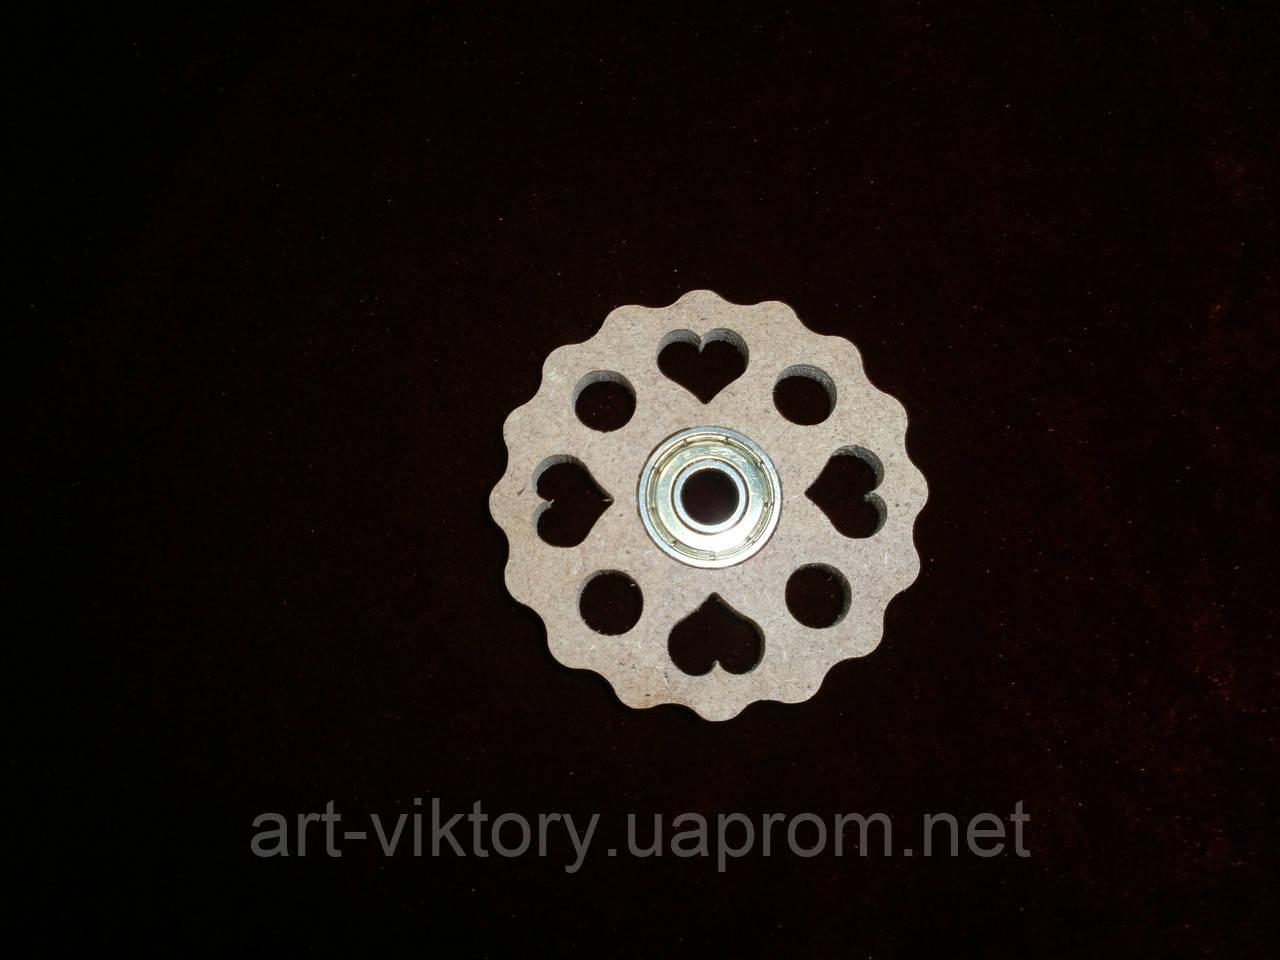 Спиннер игрушка с сердечками (6,5 х 6,5 см), декор